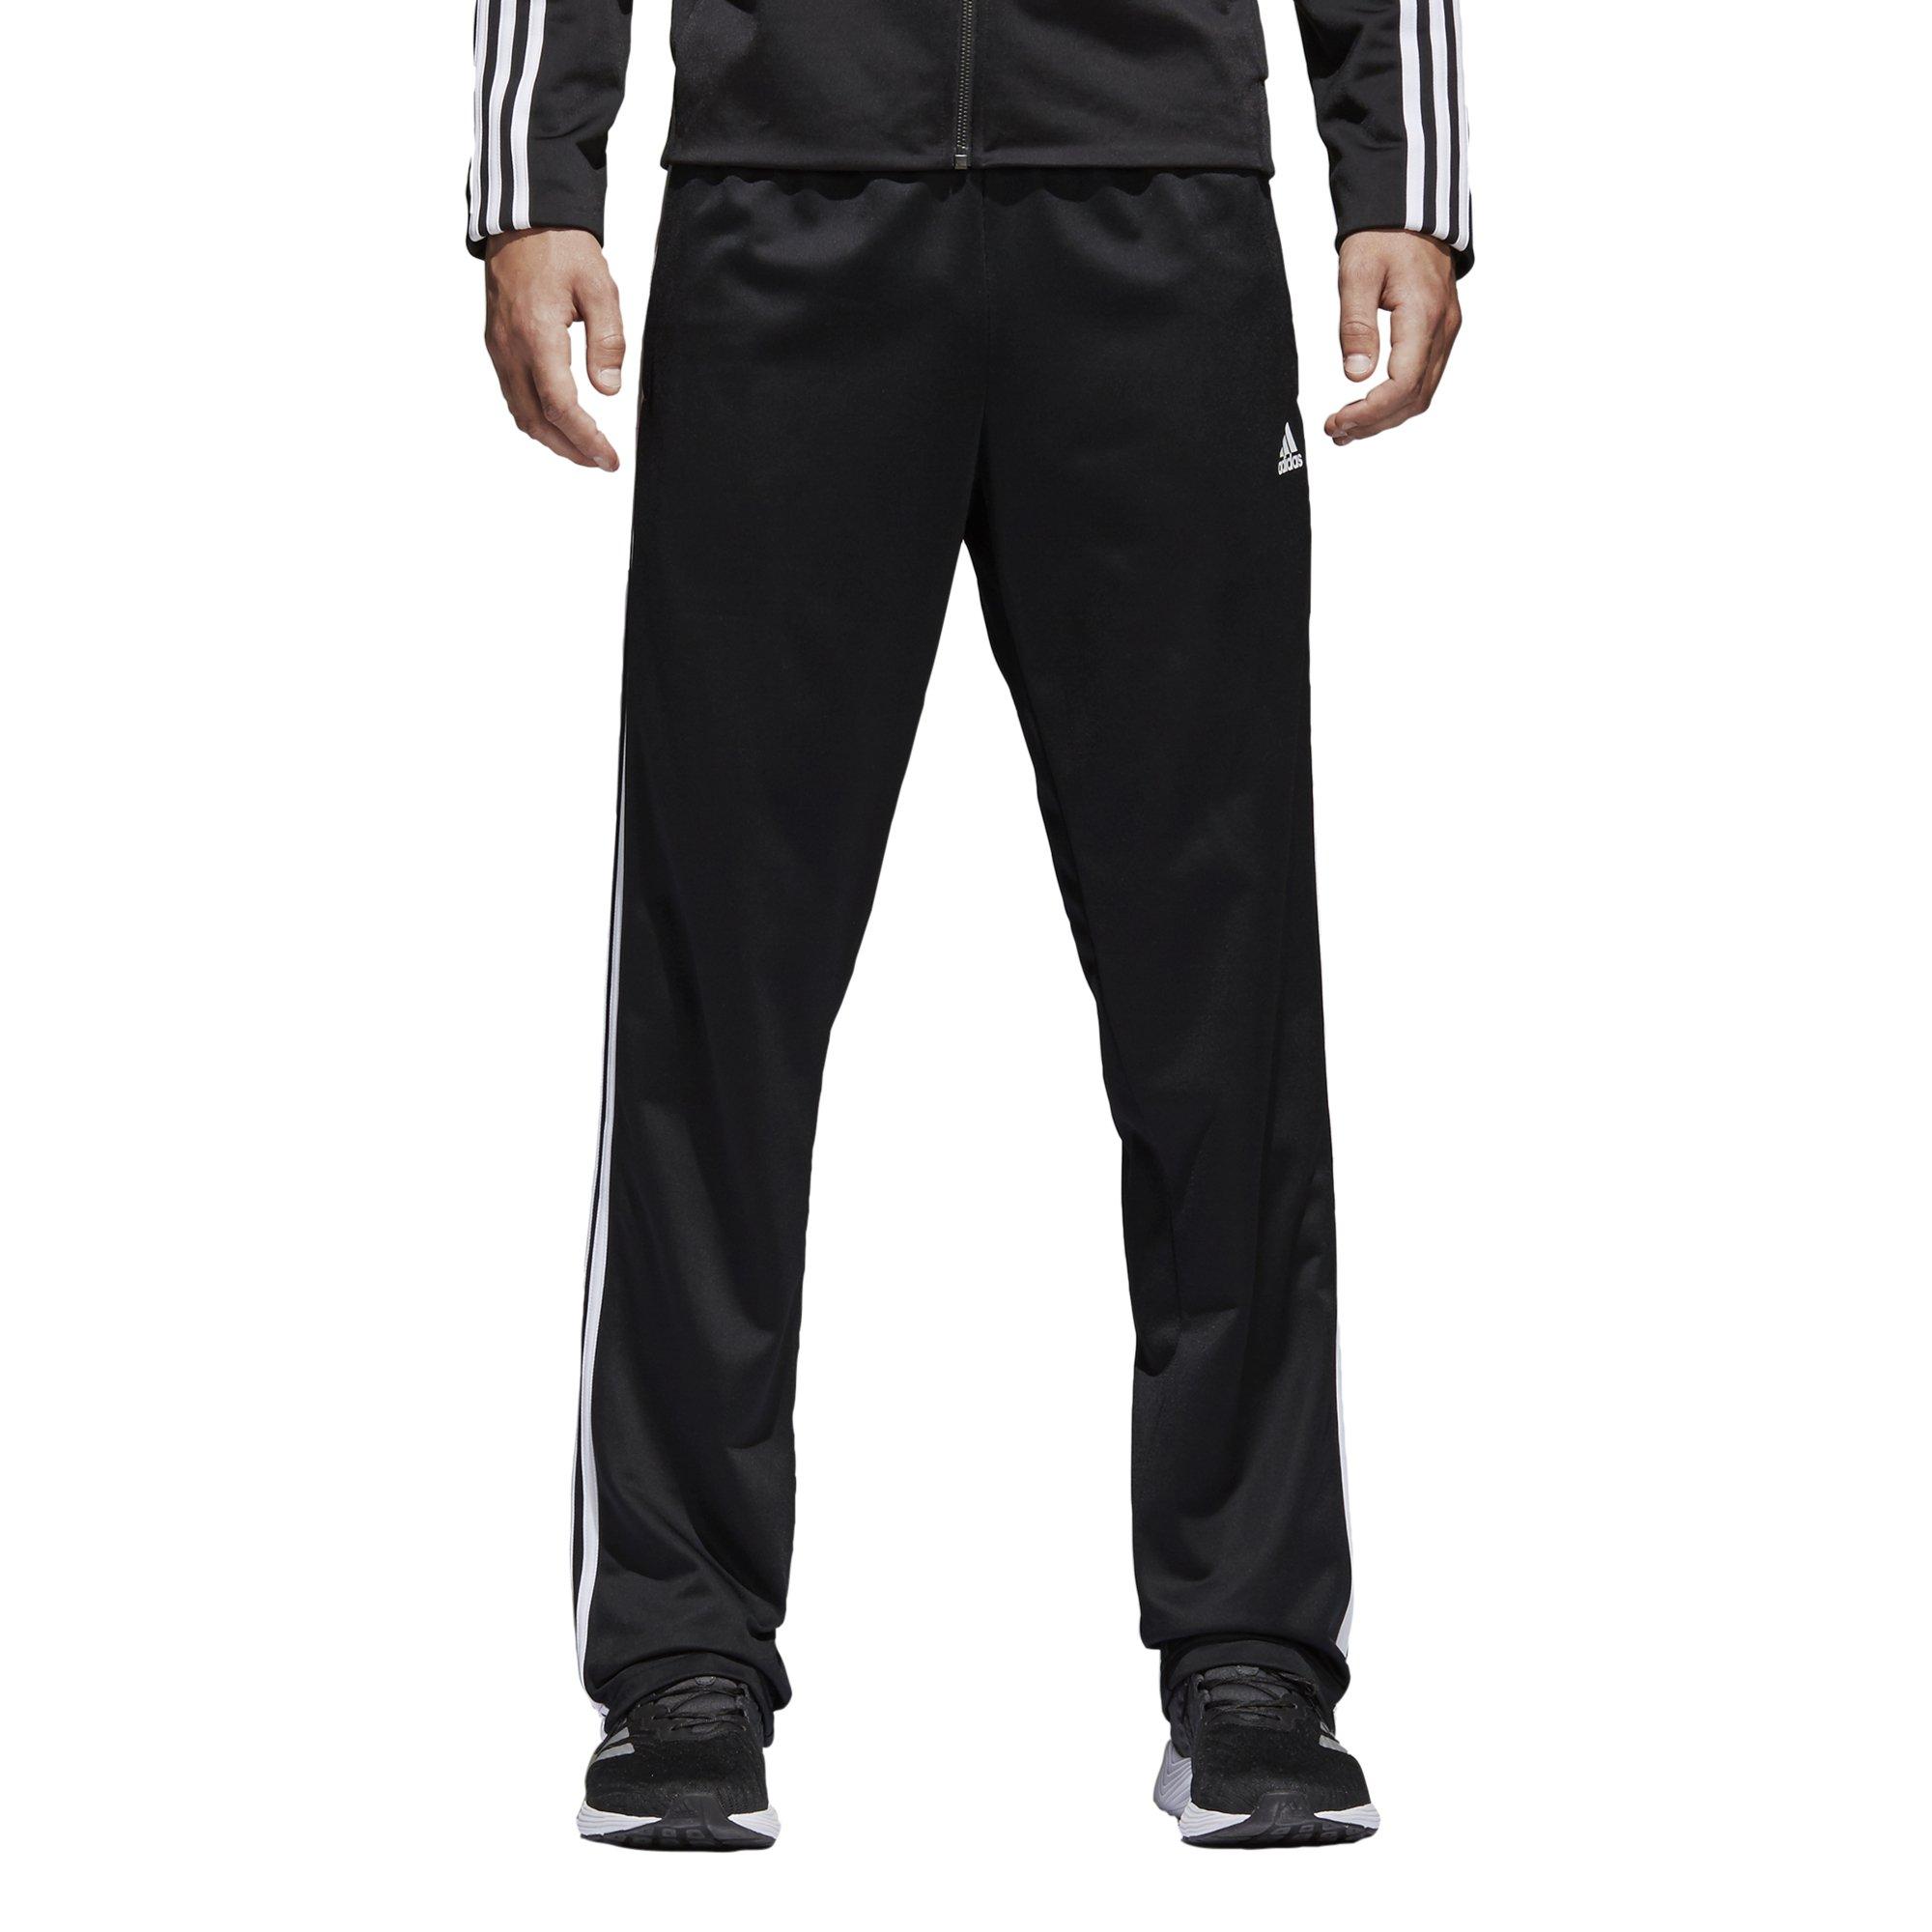 adidas Men's Athletics Essential Tricot 3-Stripe Pants, Black/White, Large